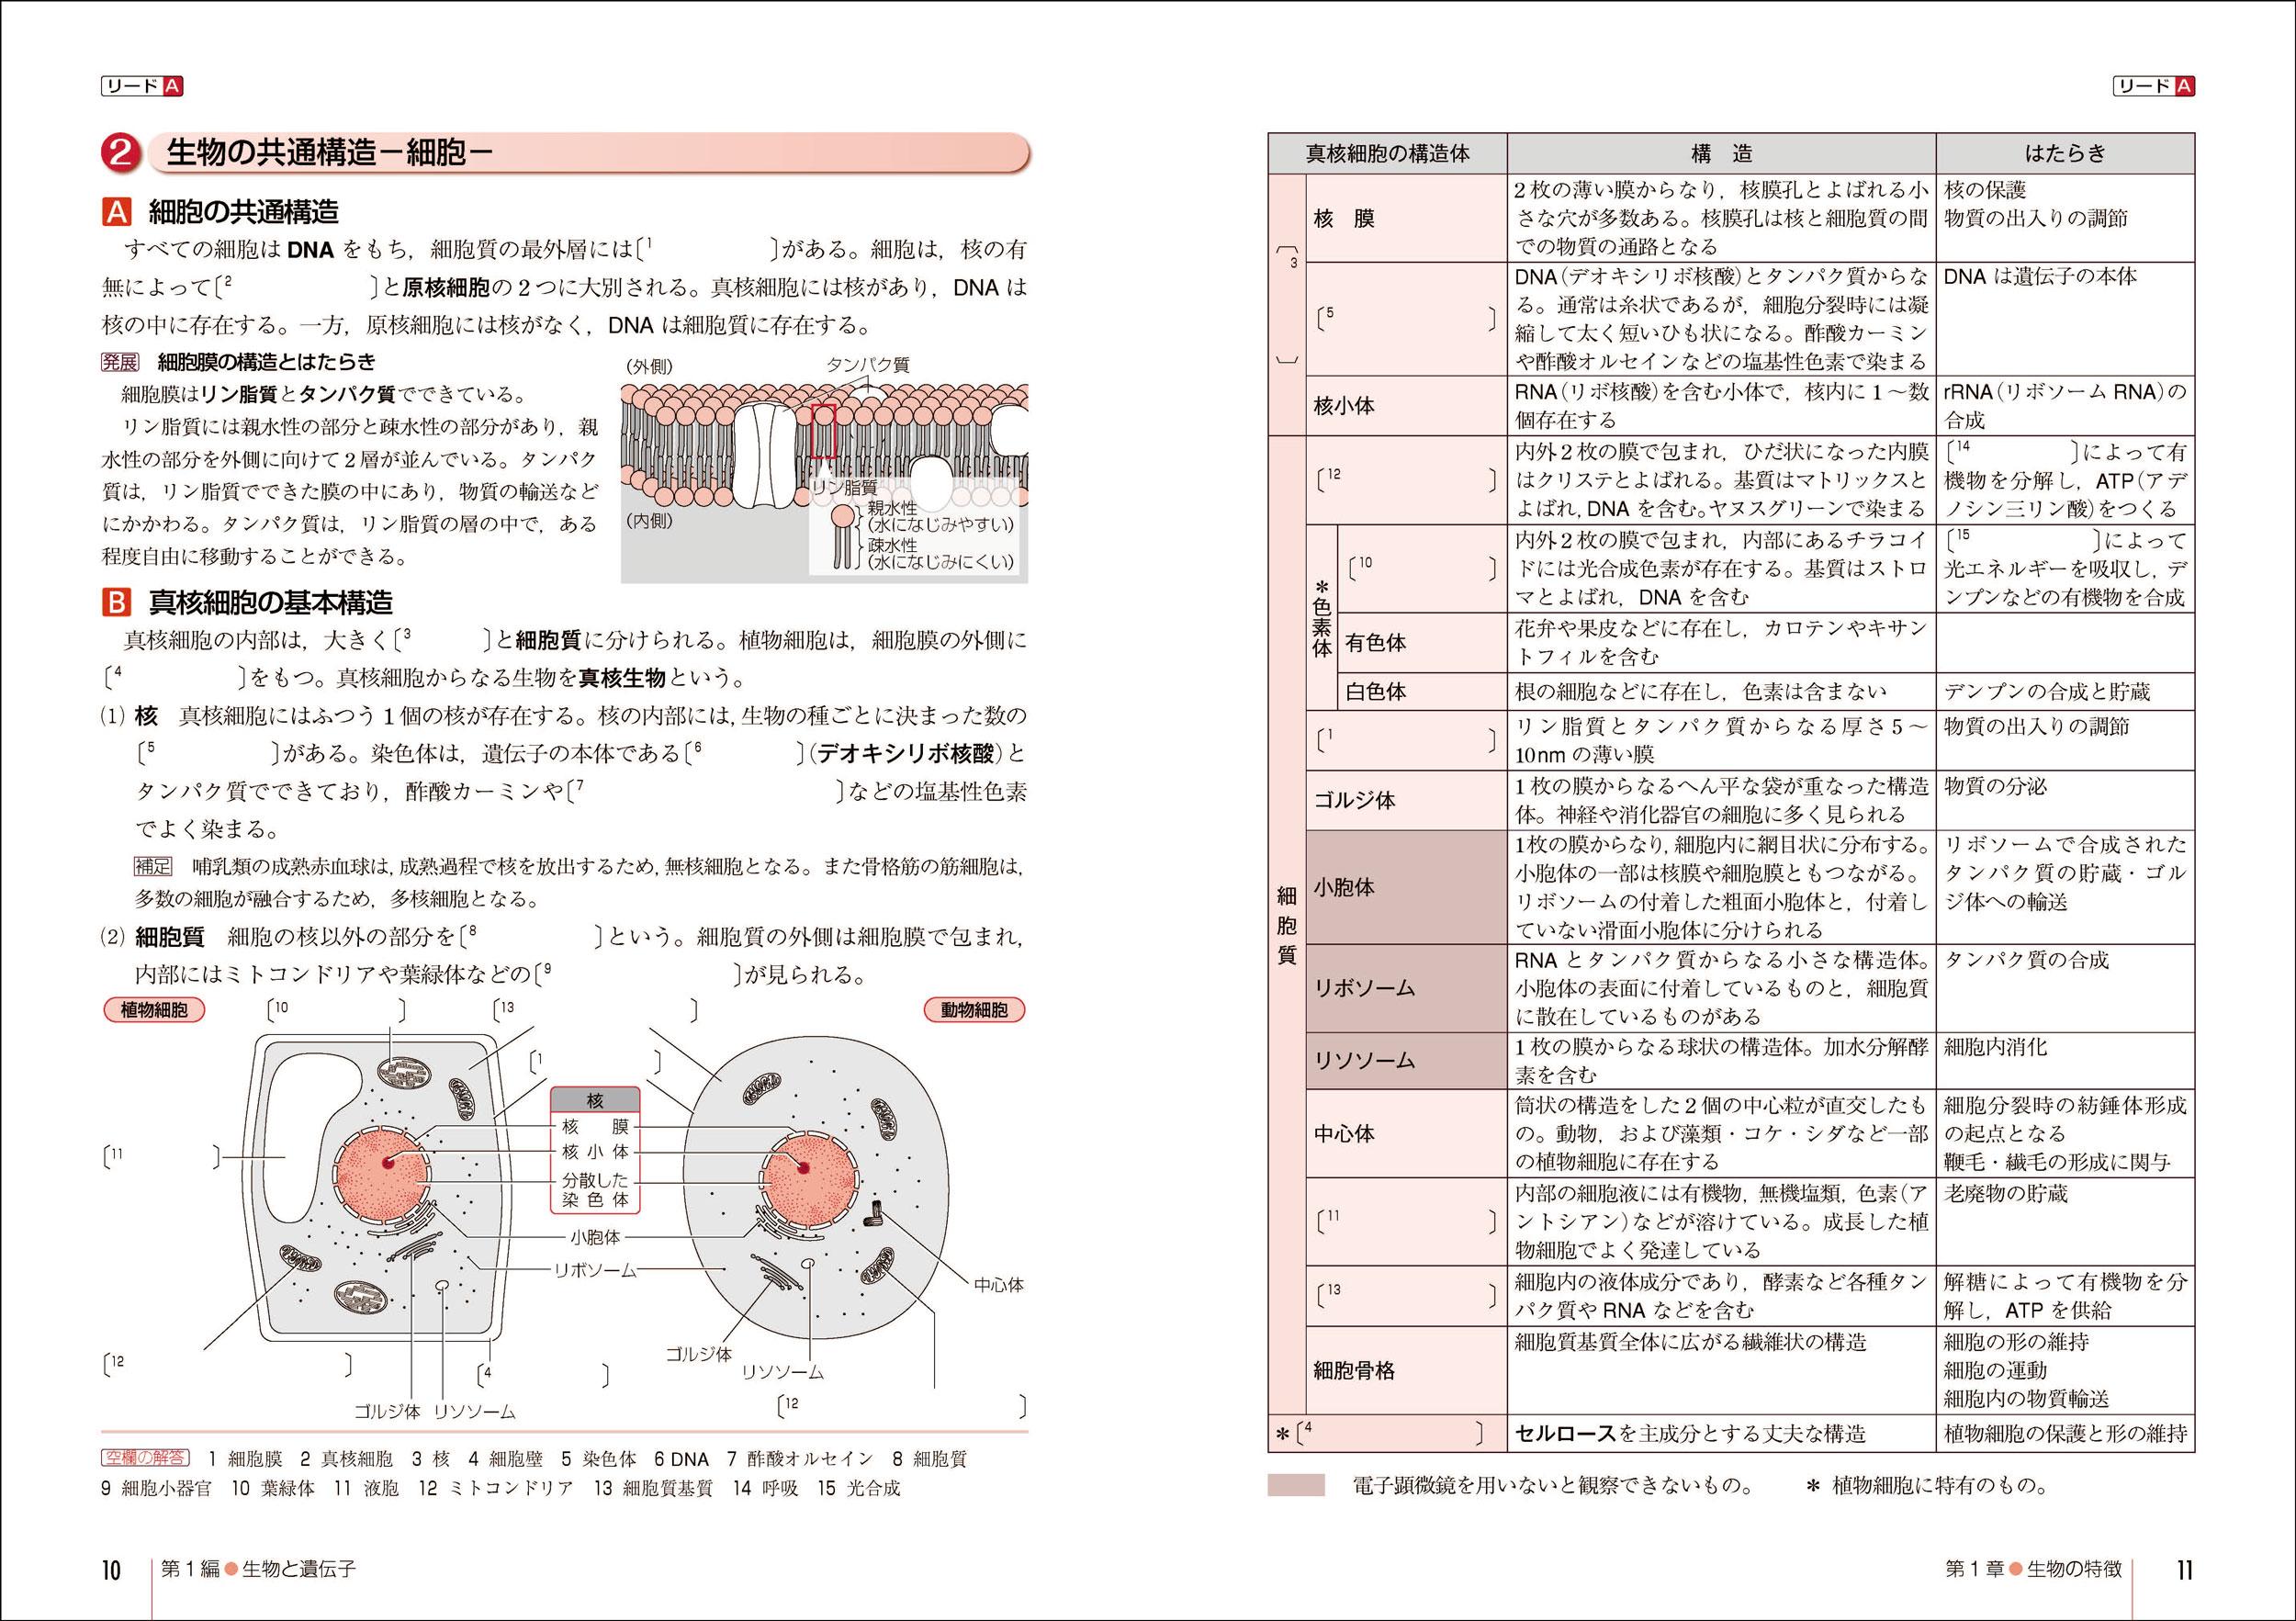 改訂版 リードLightノート生物 ... : 中学生 数学 問題集 : 中学